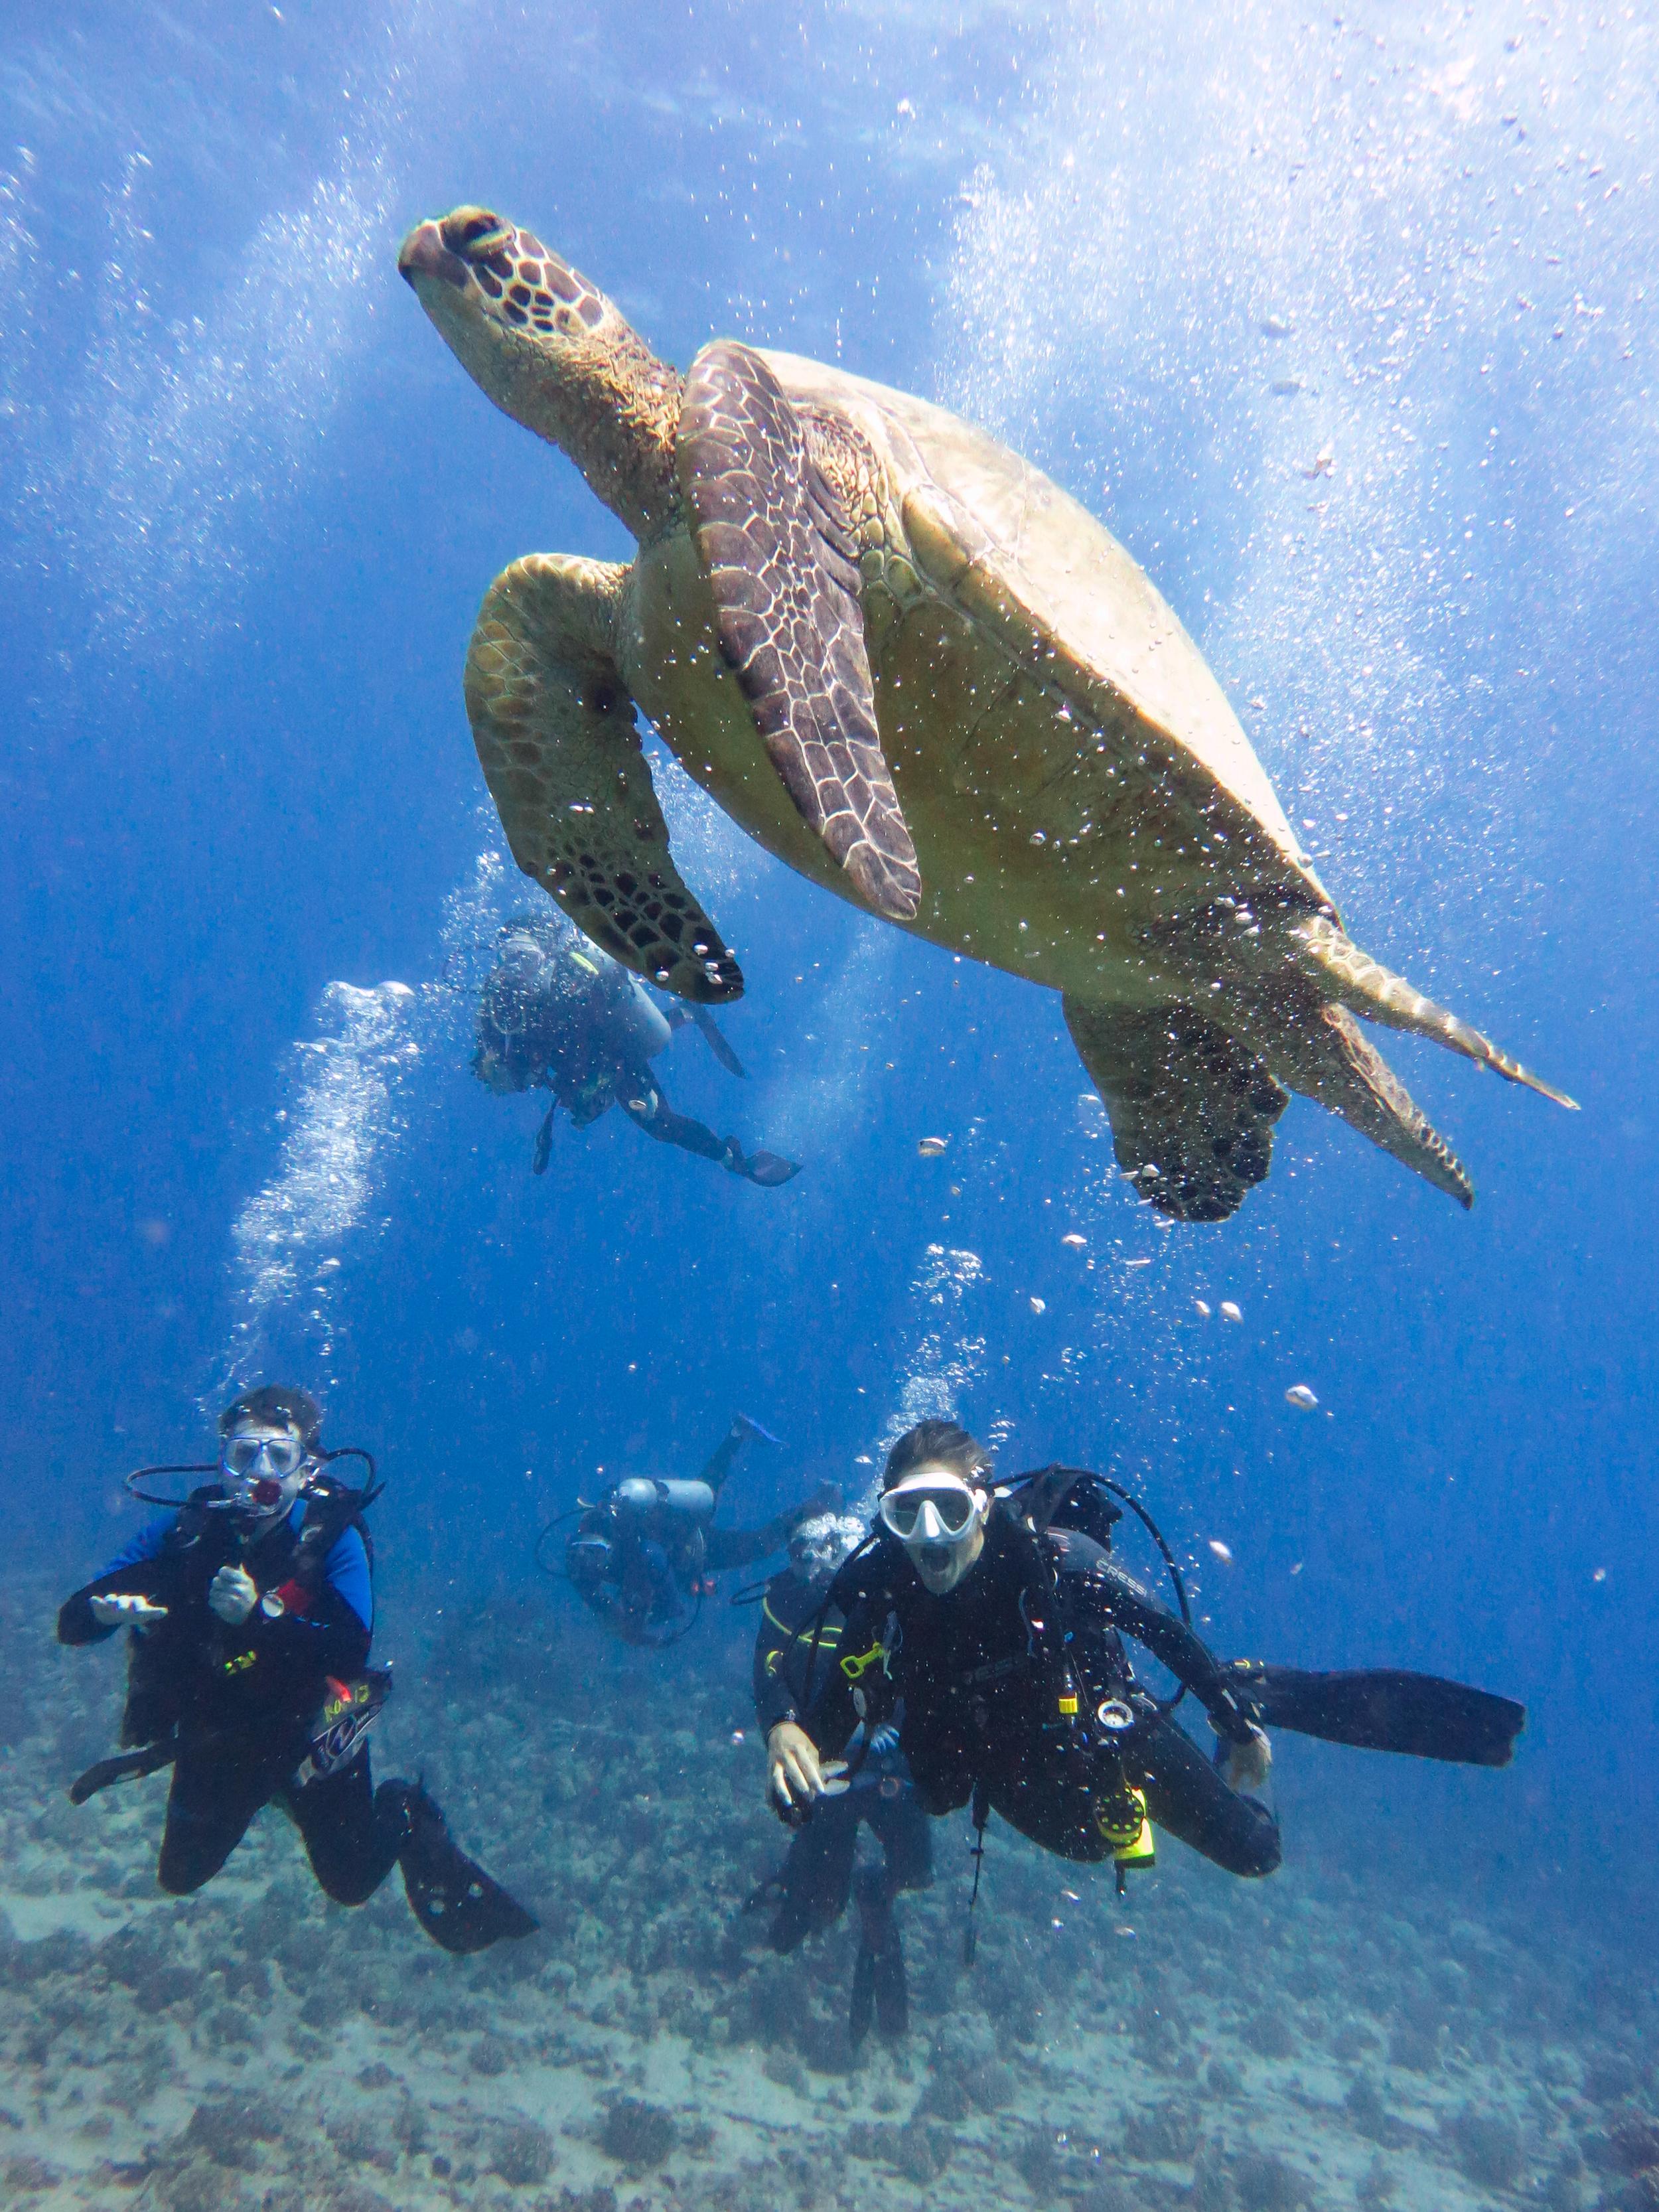 Turtles Sightings Guaranteed!